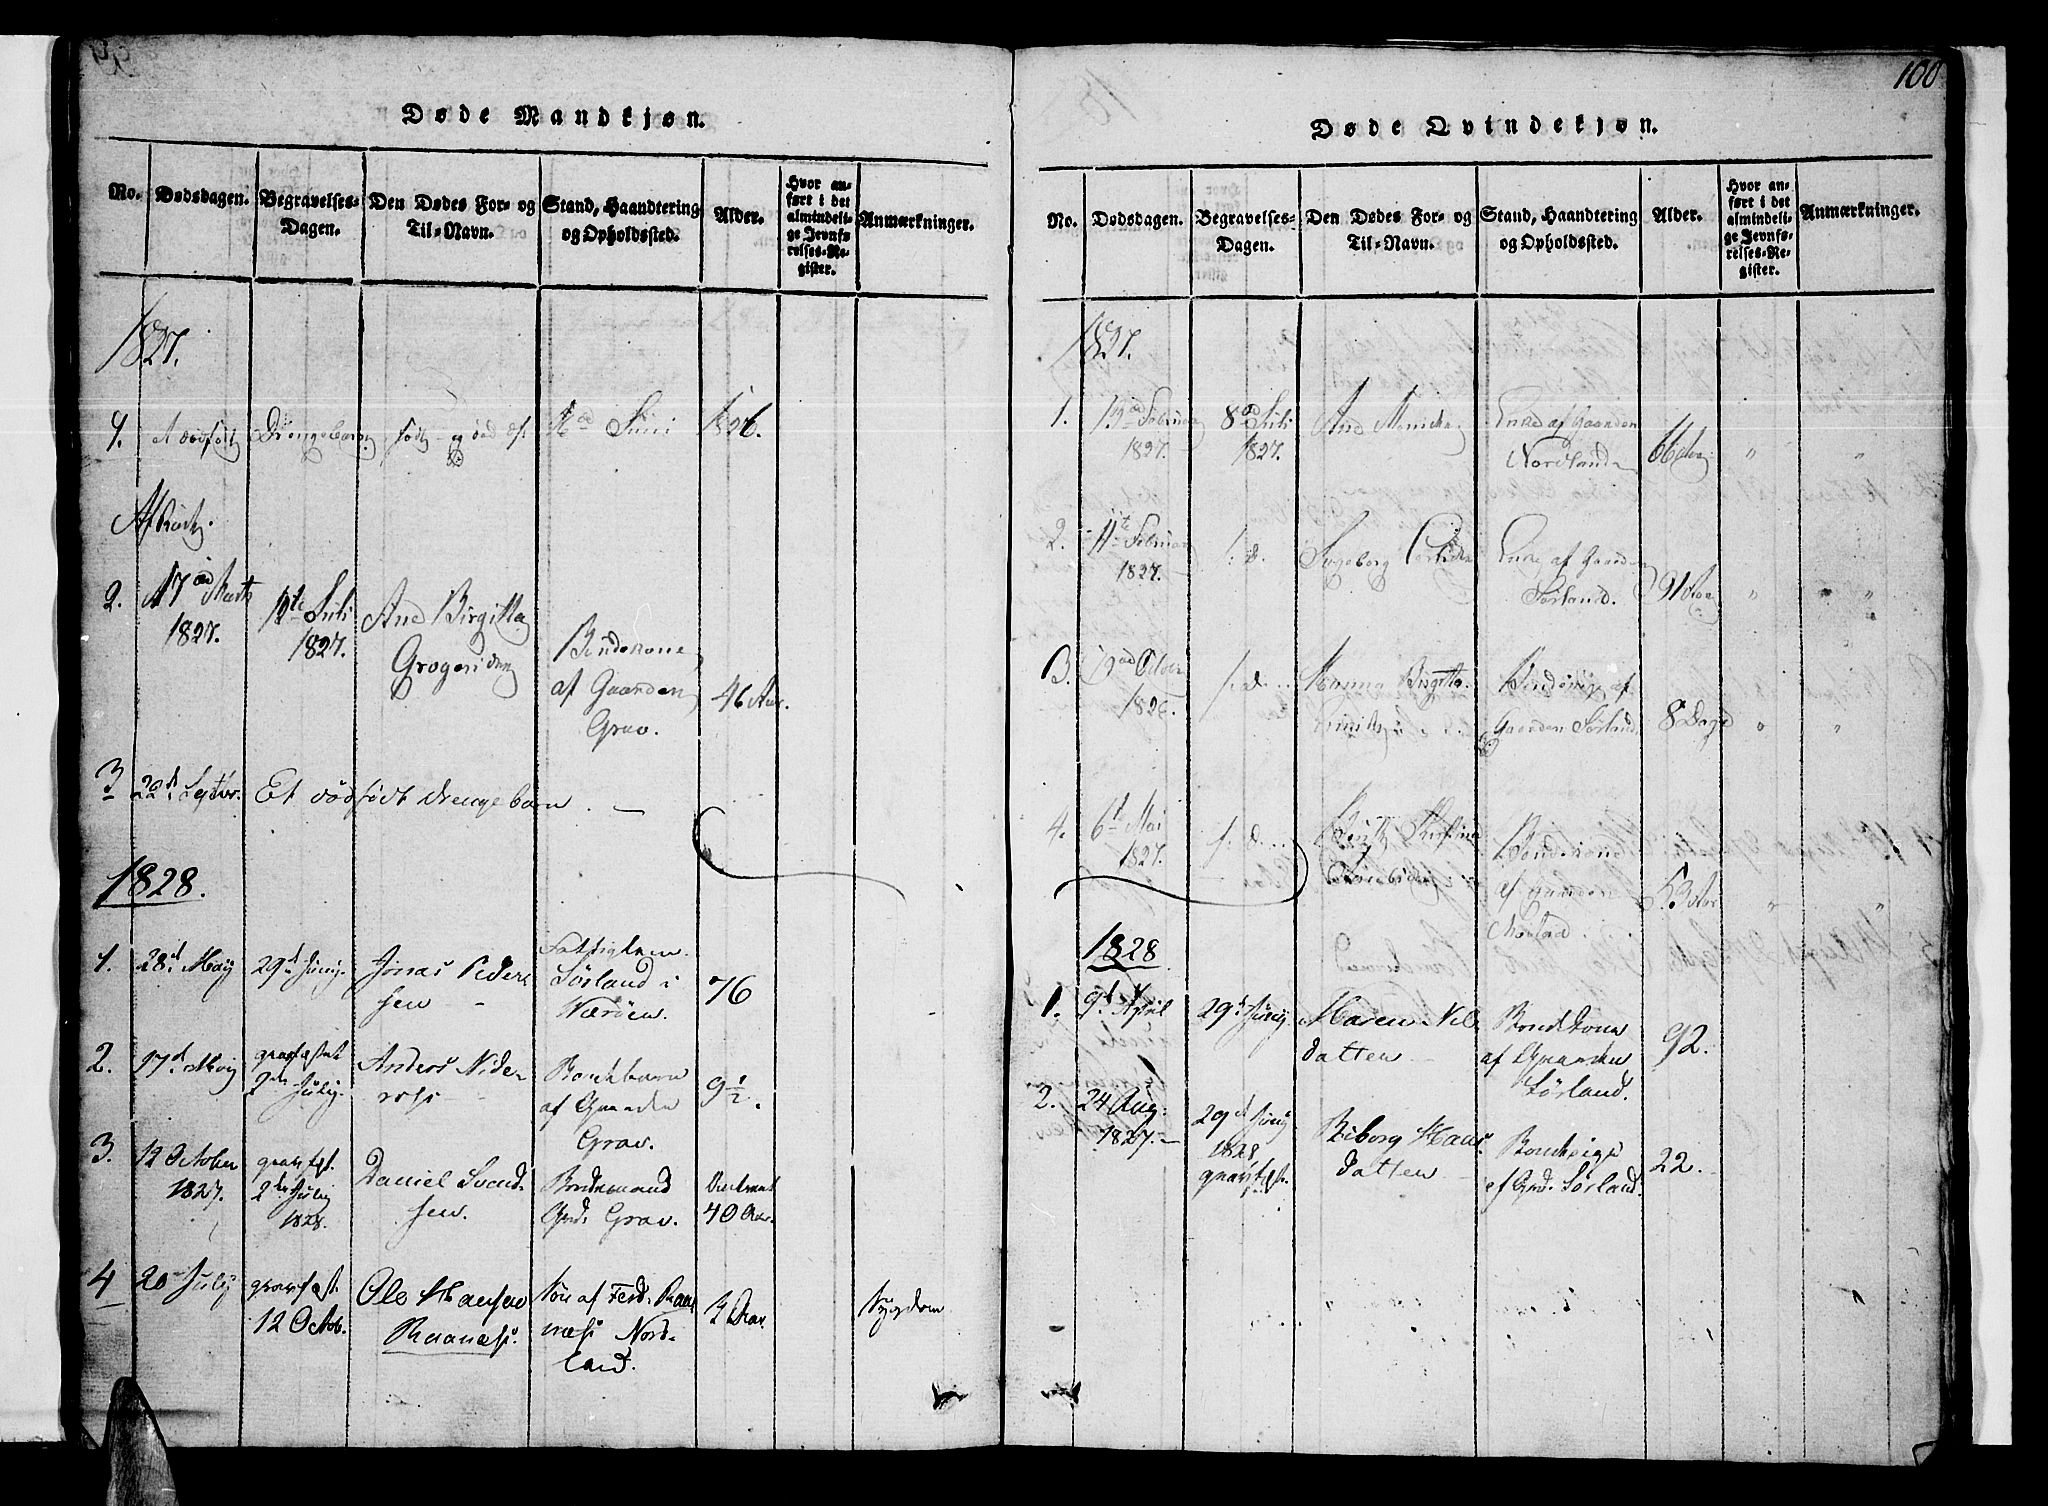 SAT, Ministerialprotokoller, klokkerbøker og fødselsregistre - Nordland, 807/L0120: Ministerialbok nr. 807A03, 1821-1848, s. 100